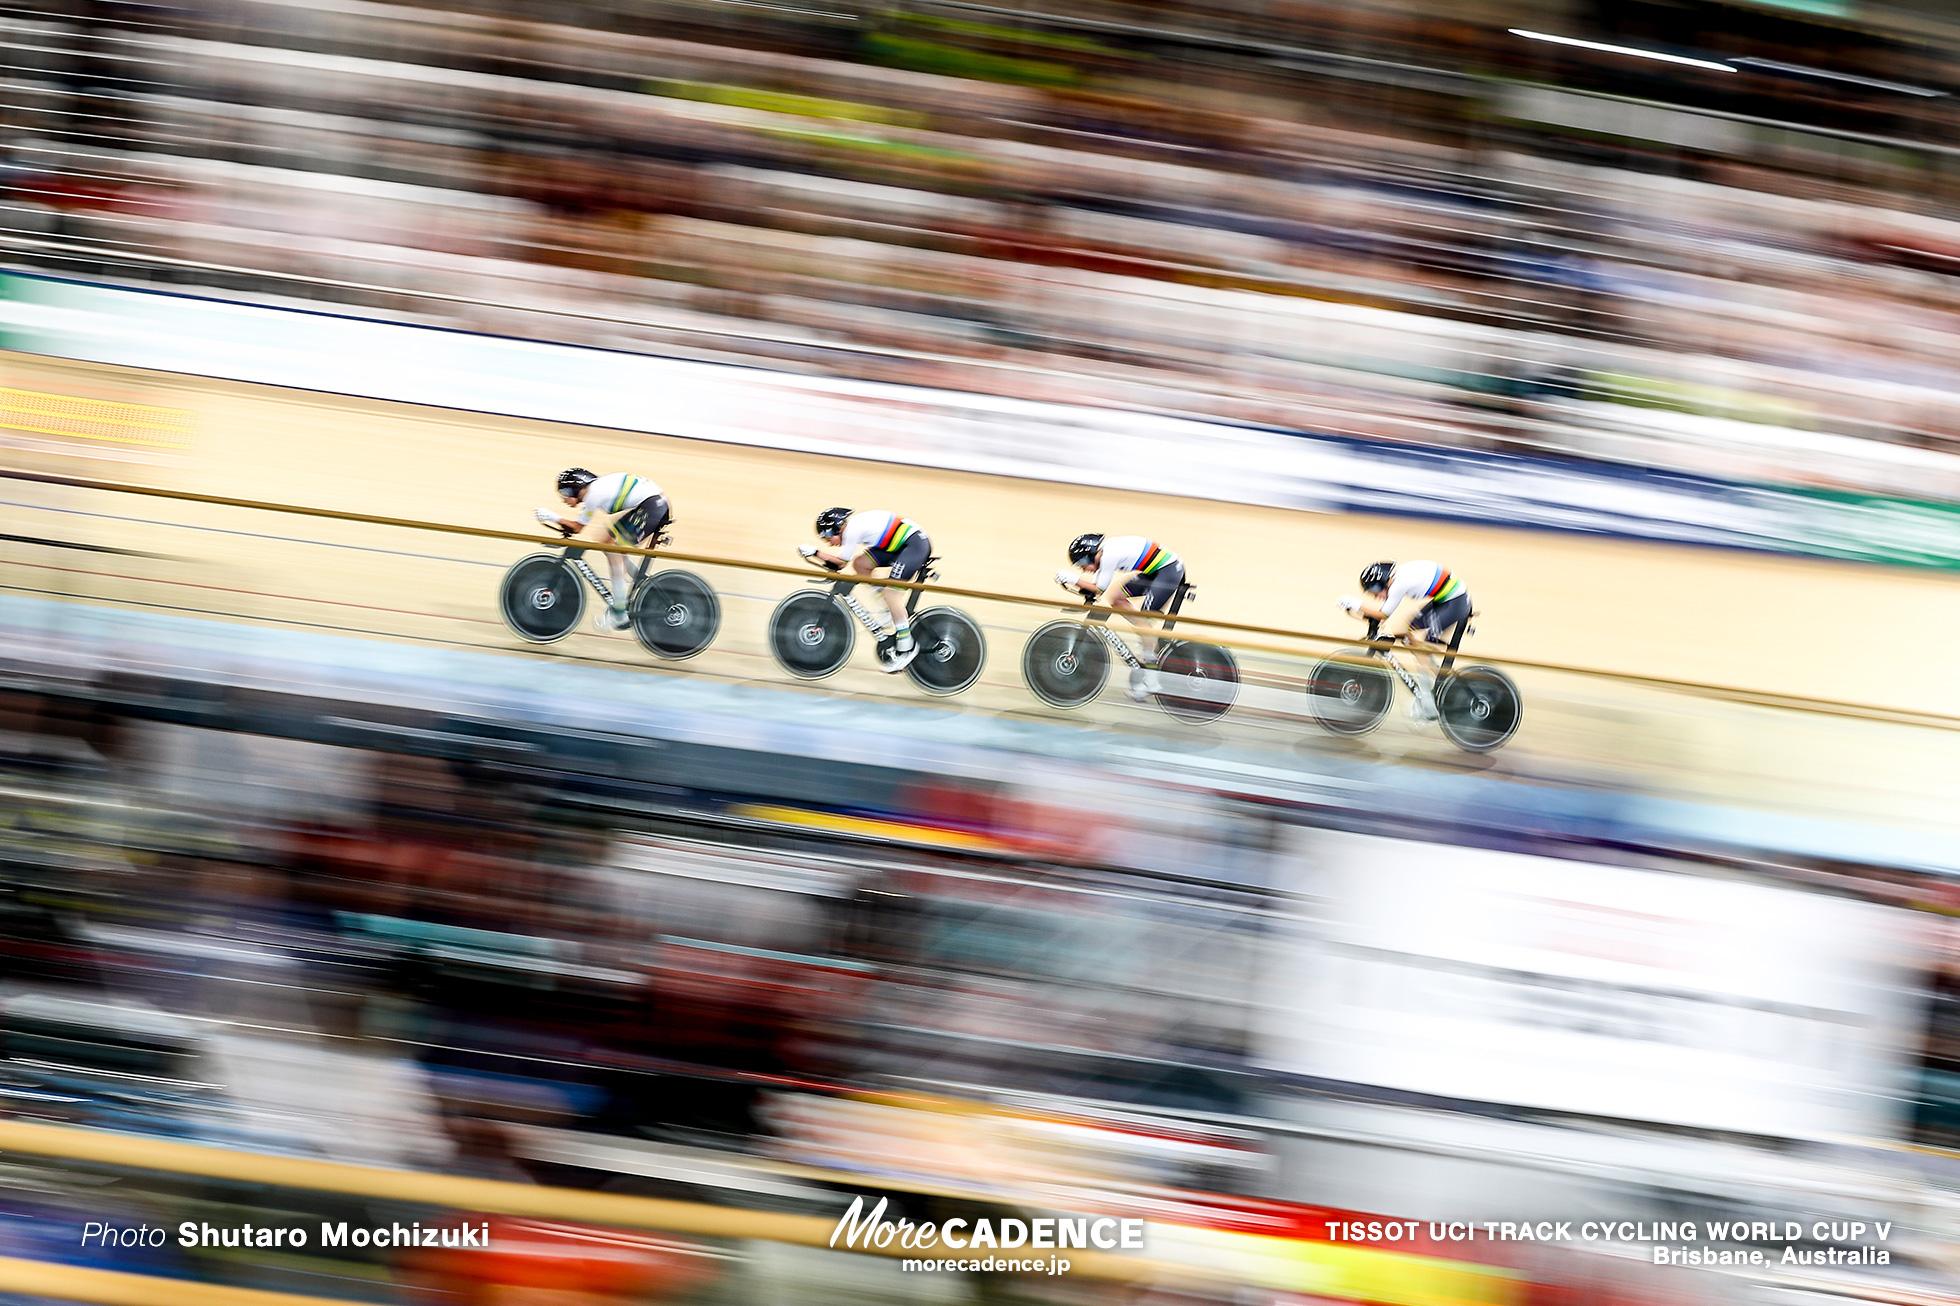 Final / Women's Team Pursuit / TISSOT UCI TRACK CYCLING WORLD CUP V, Brisbane, Australia, Georgia BAKER ジョージア・バーカー Annette EDMONDSON アネット・エドモンソン Ashlee ANKUDINOFF アシュリー・アンクディノフ Maeve PLOUFFE メーブ・プルーフ